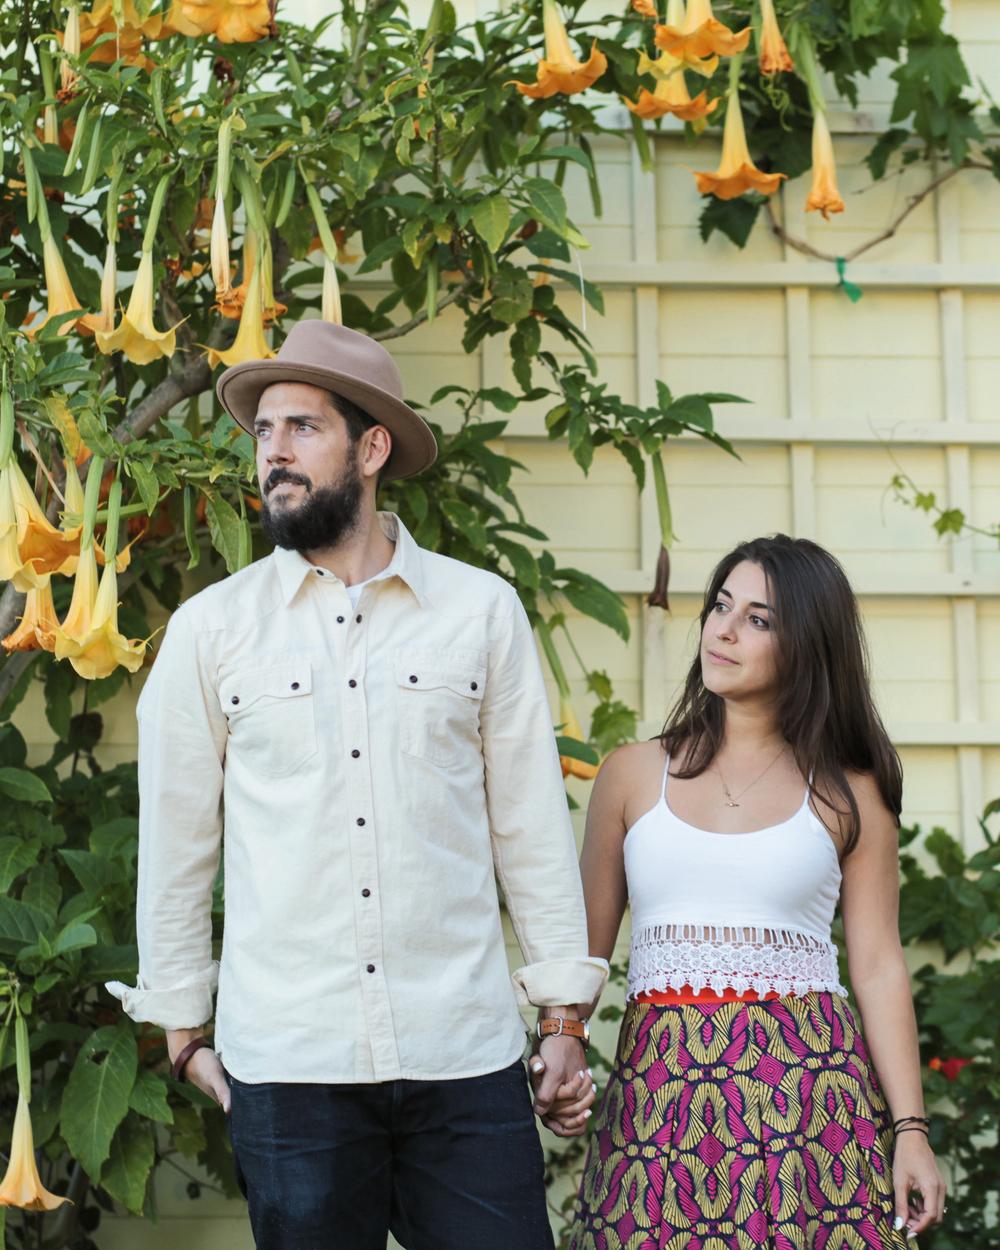 Freenote Cloth Modern Western Shirt| Yellow108 Luke Fedora | Pinko Skirt| Crop Top